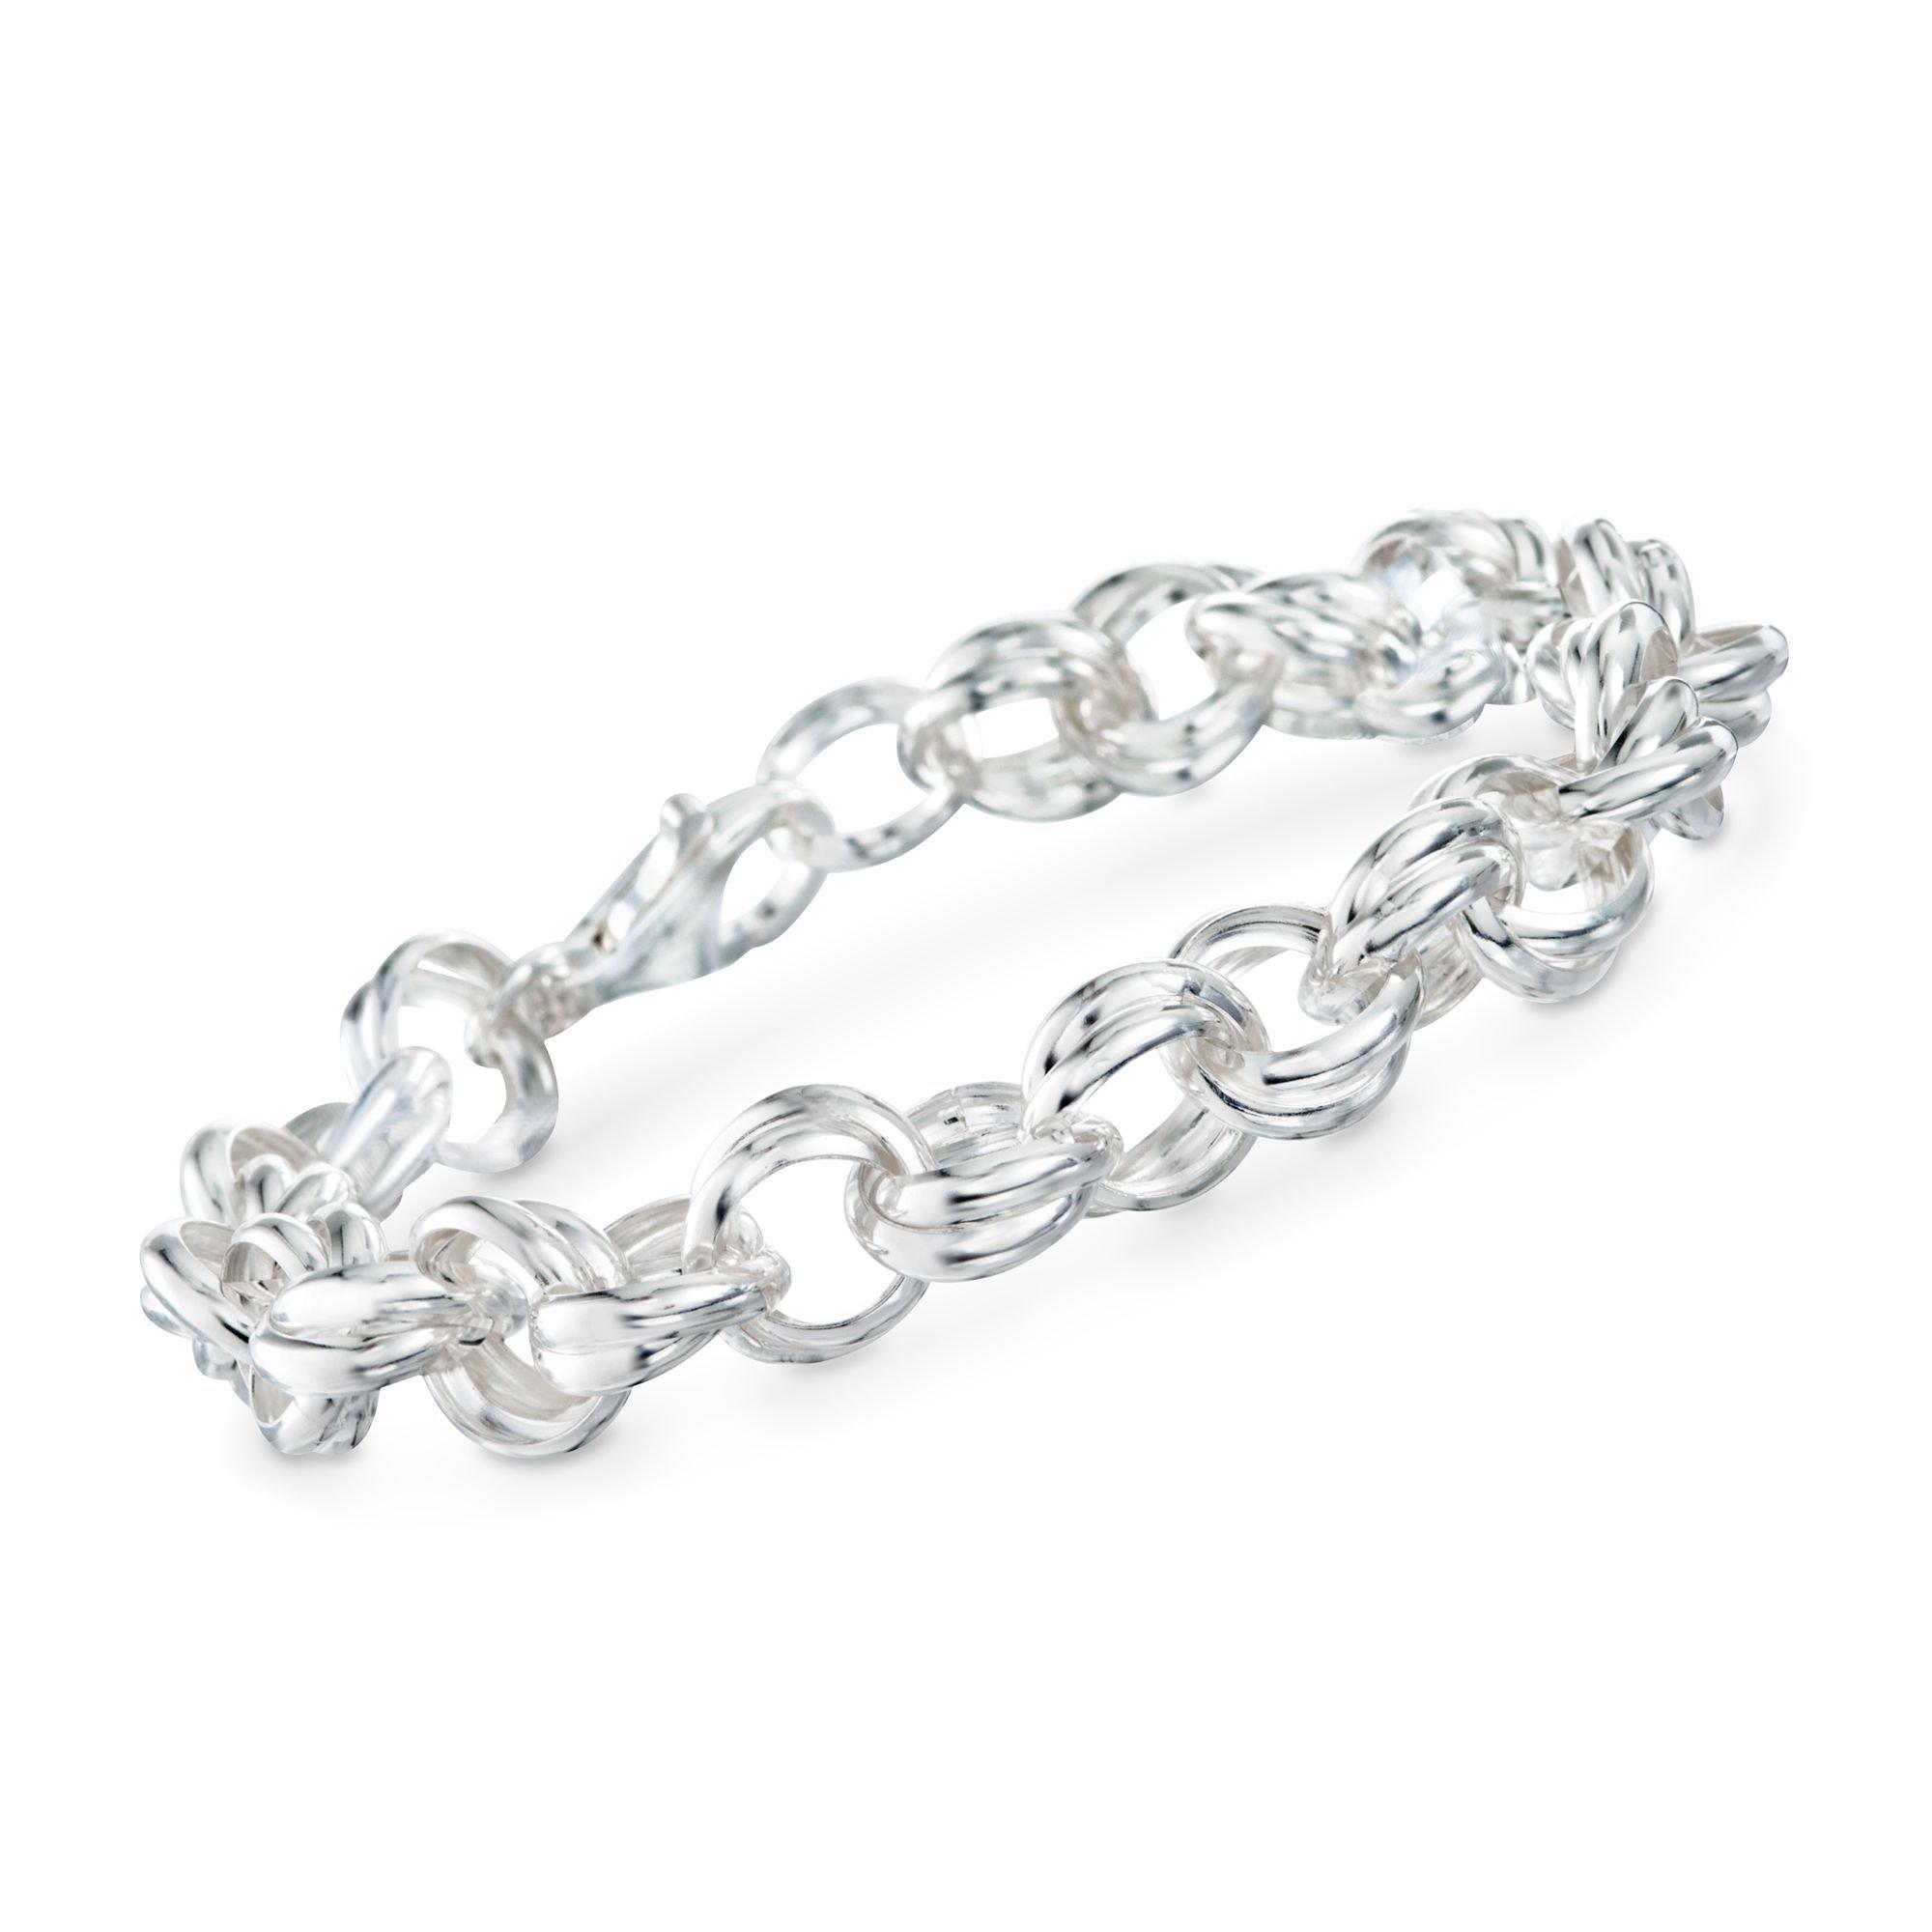 Ross-Simons Italian Sterling Silver Rolo Link Chain Bracelet